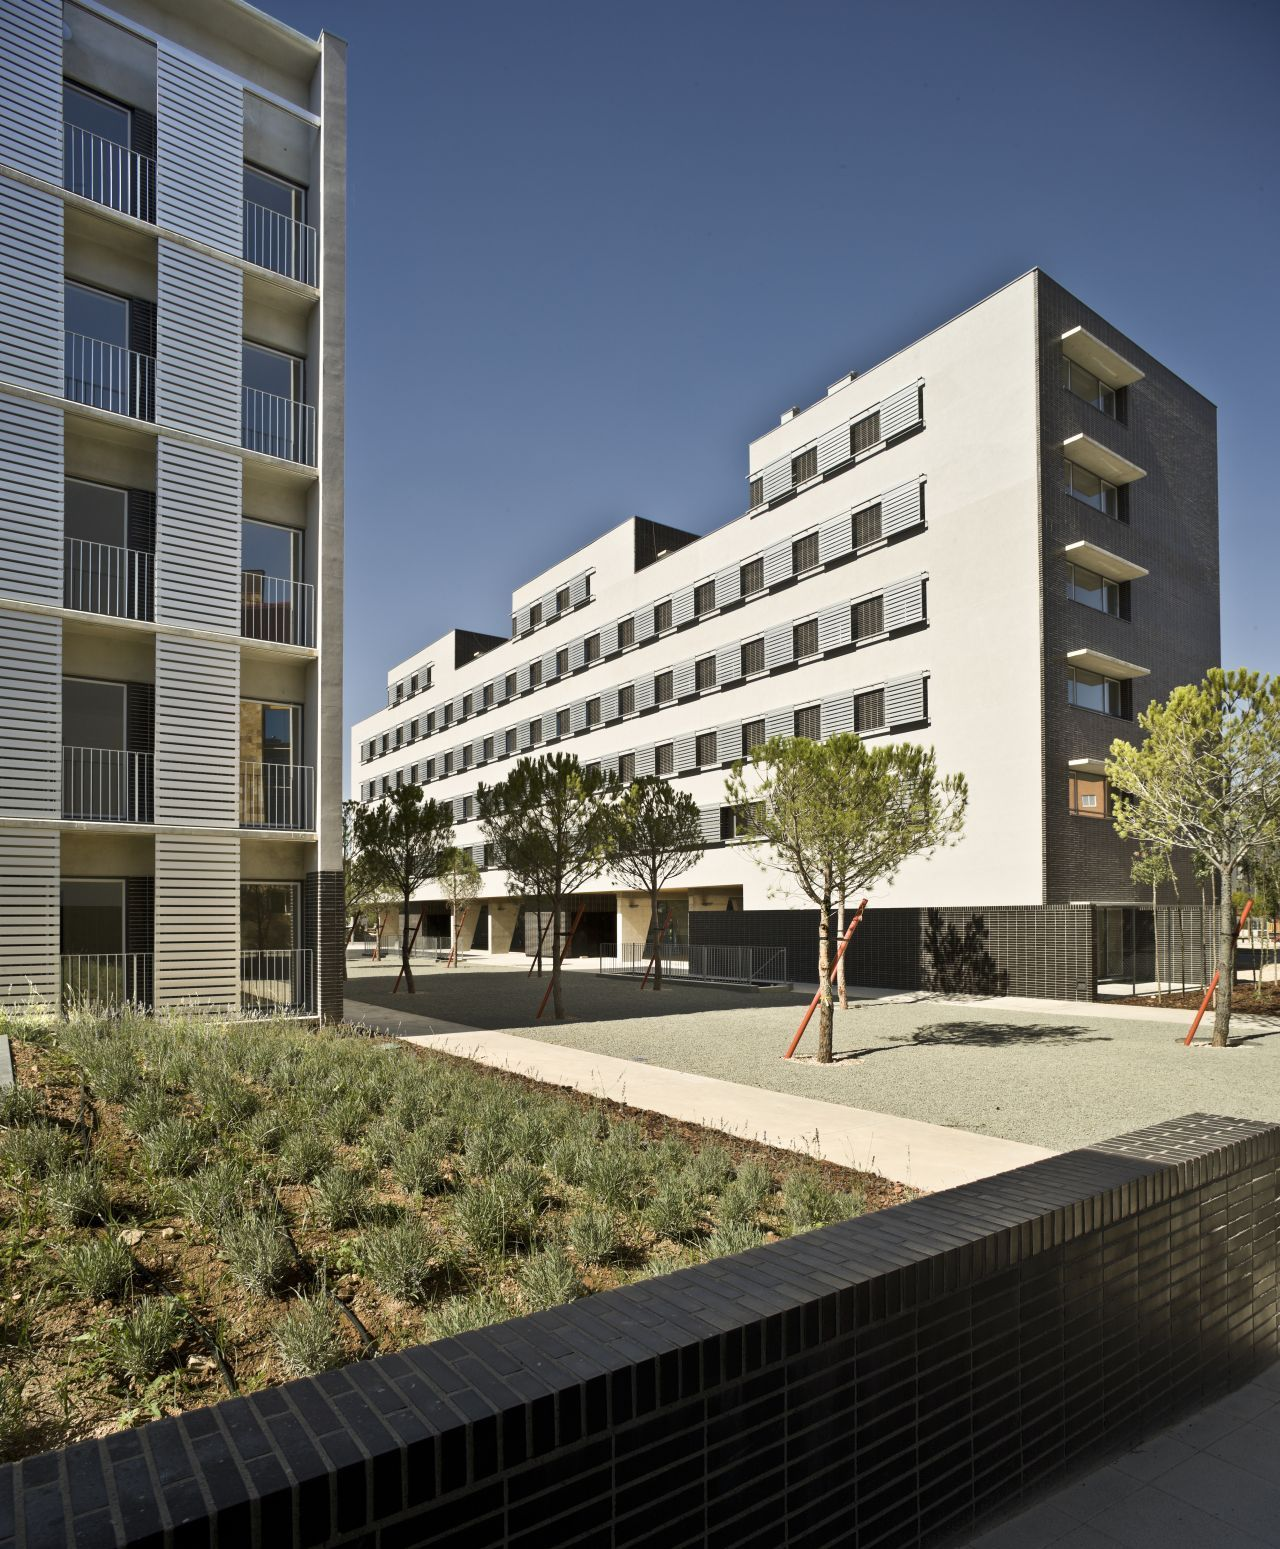 Conjunto habitacional em albacete burgos garrido arquitectos archdaily brasil - Arquitectos albacete ...